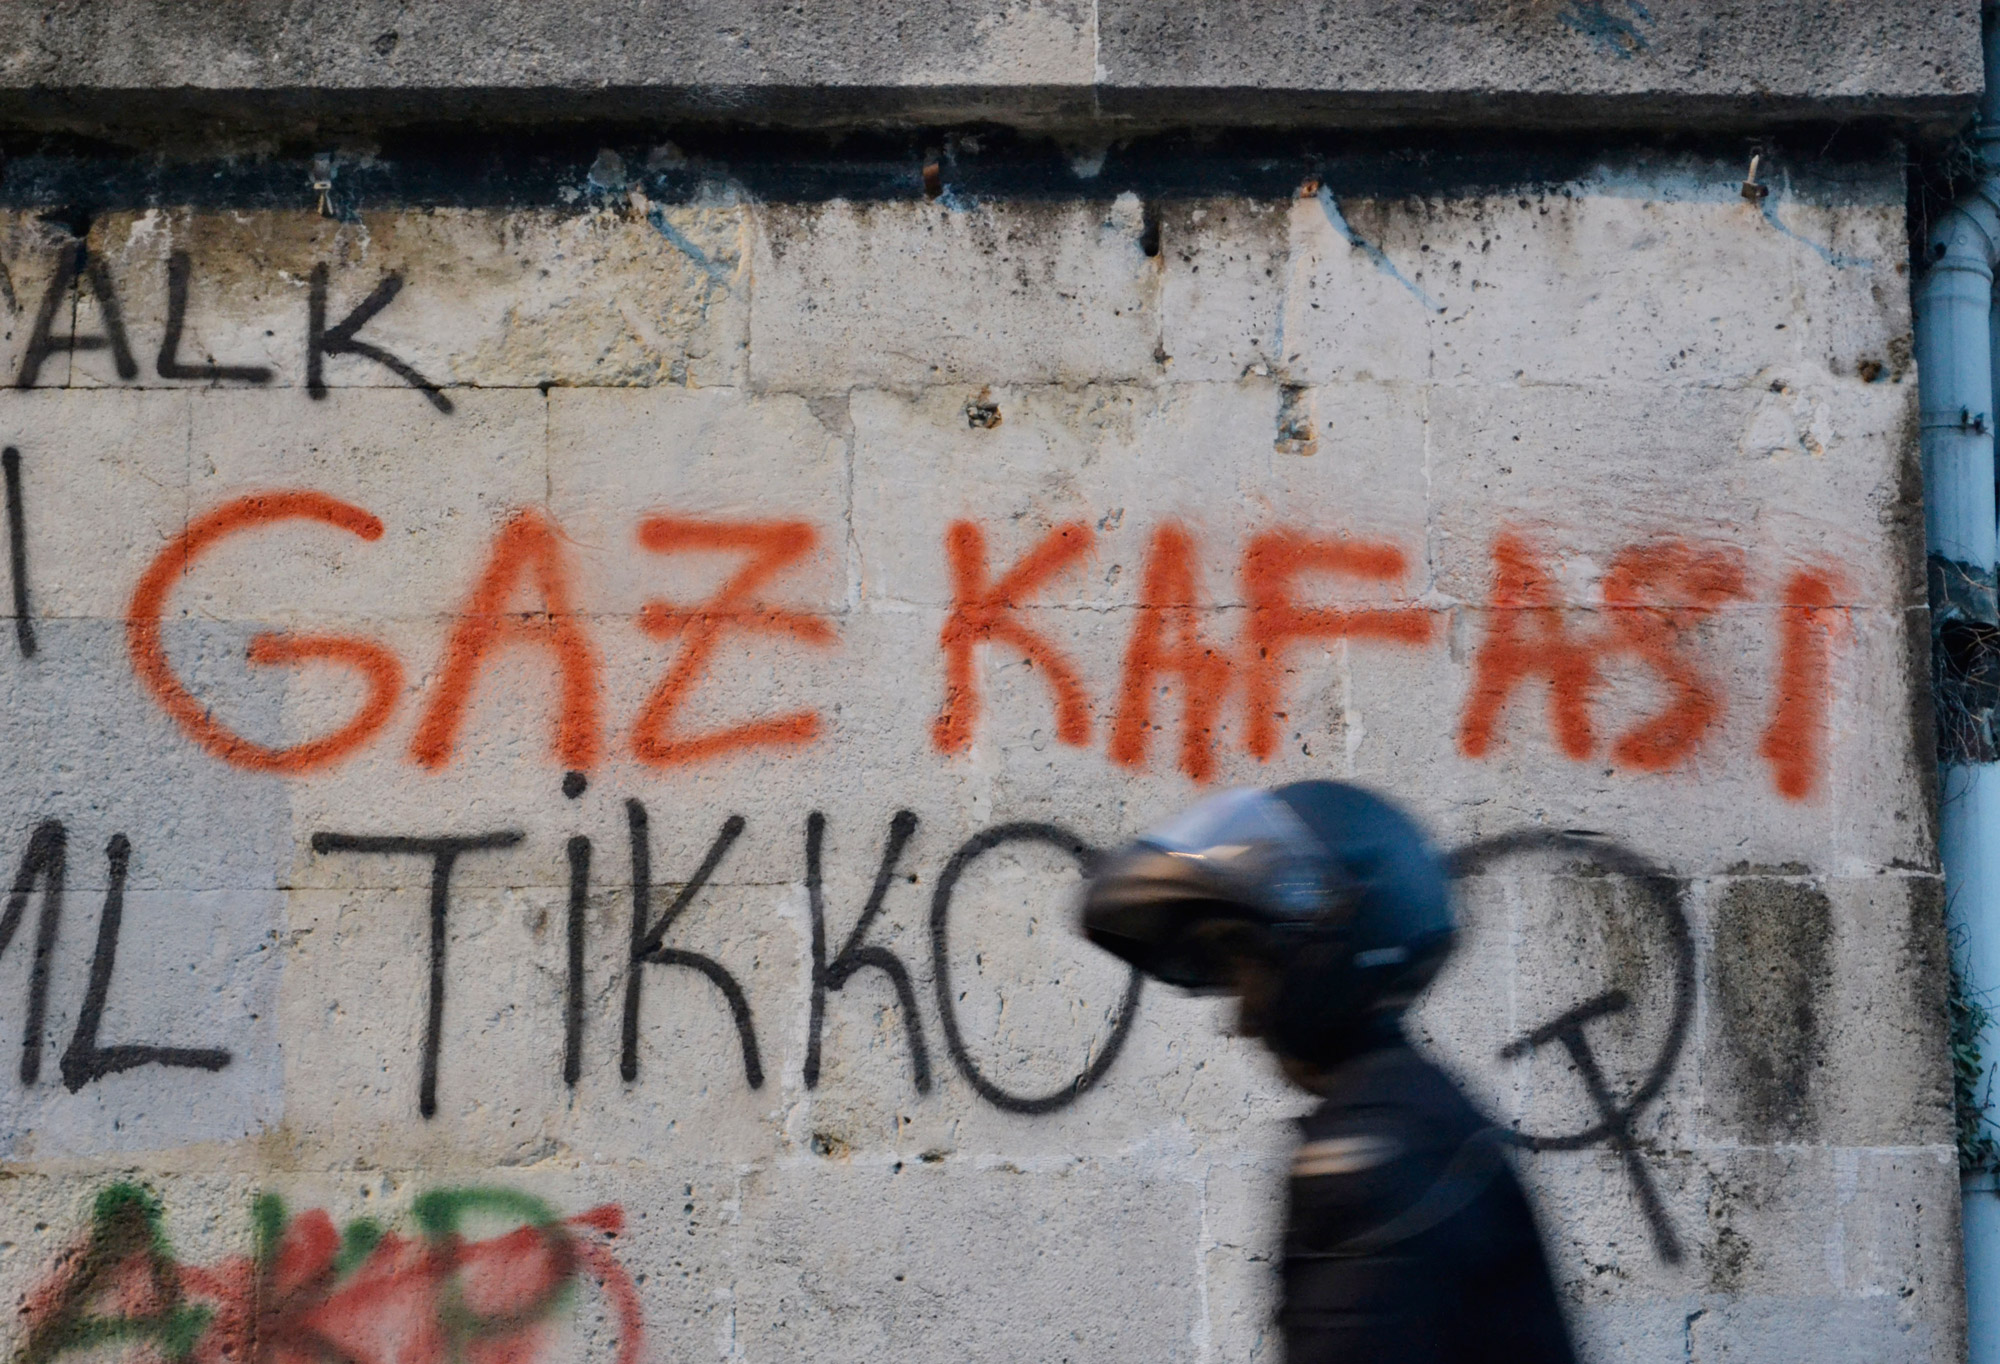 urbanbacklog-istanbul-gezi-protests-2.jpg